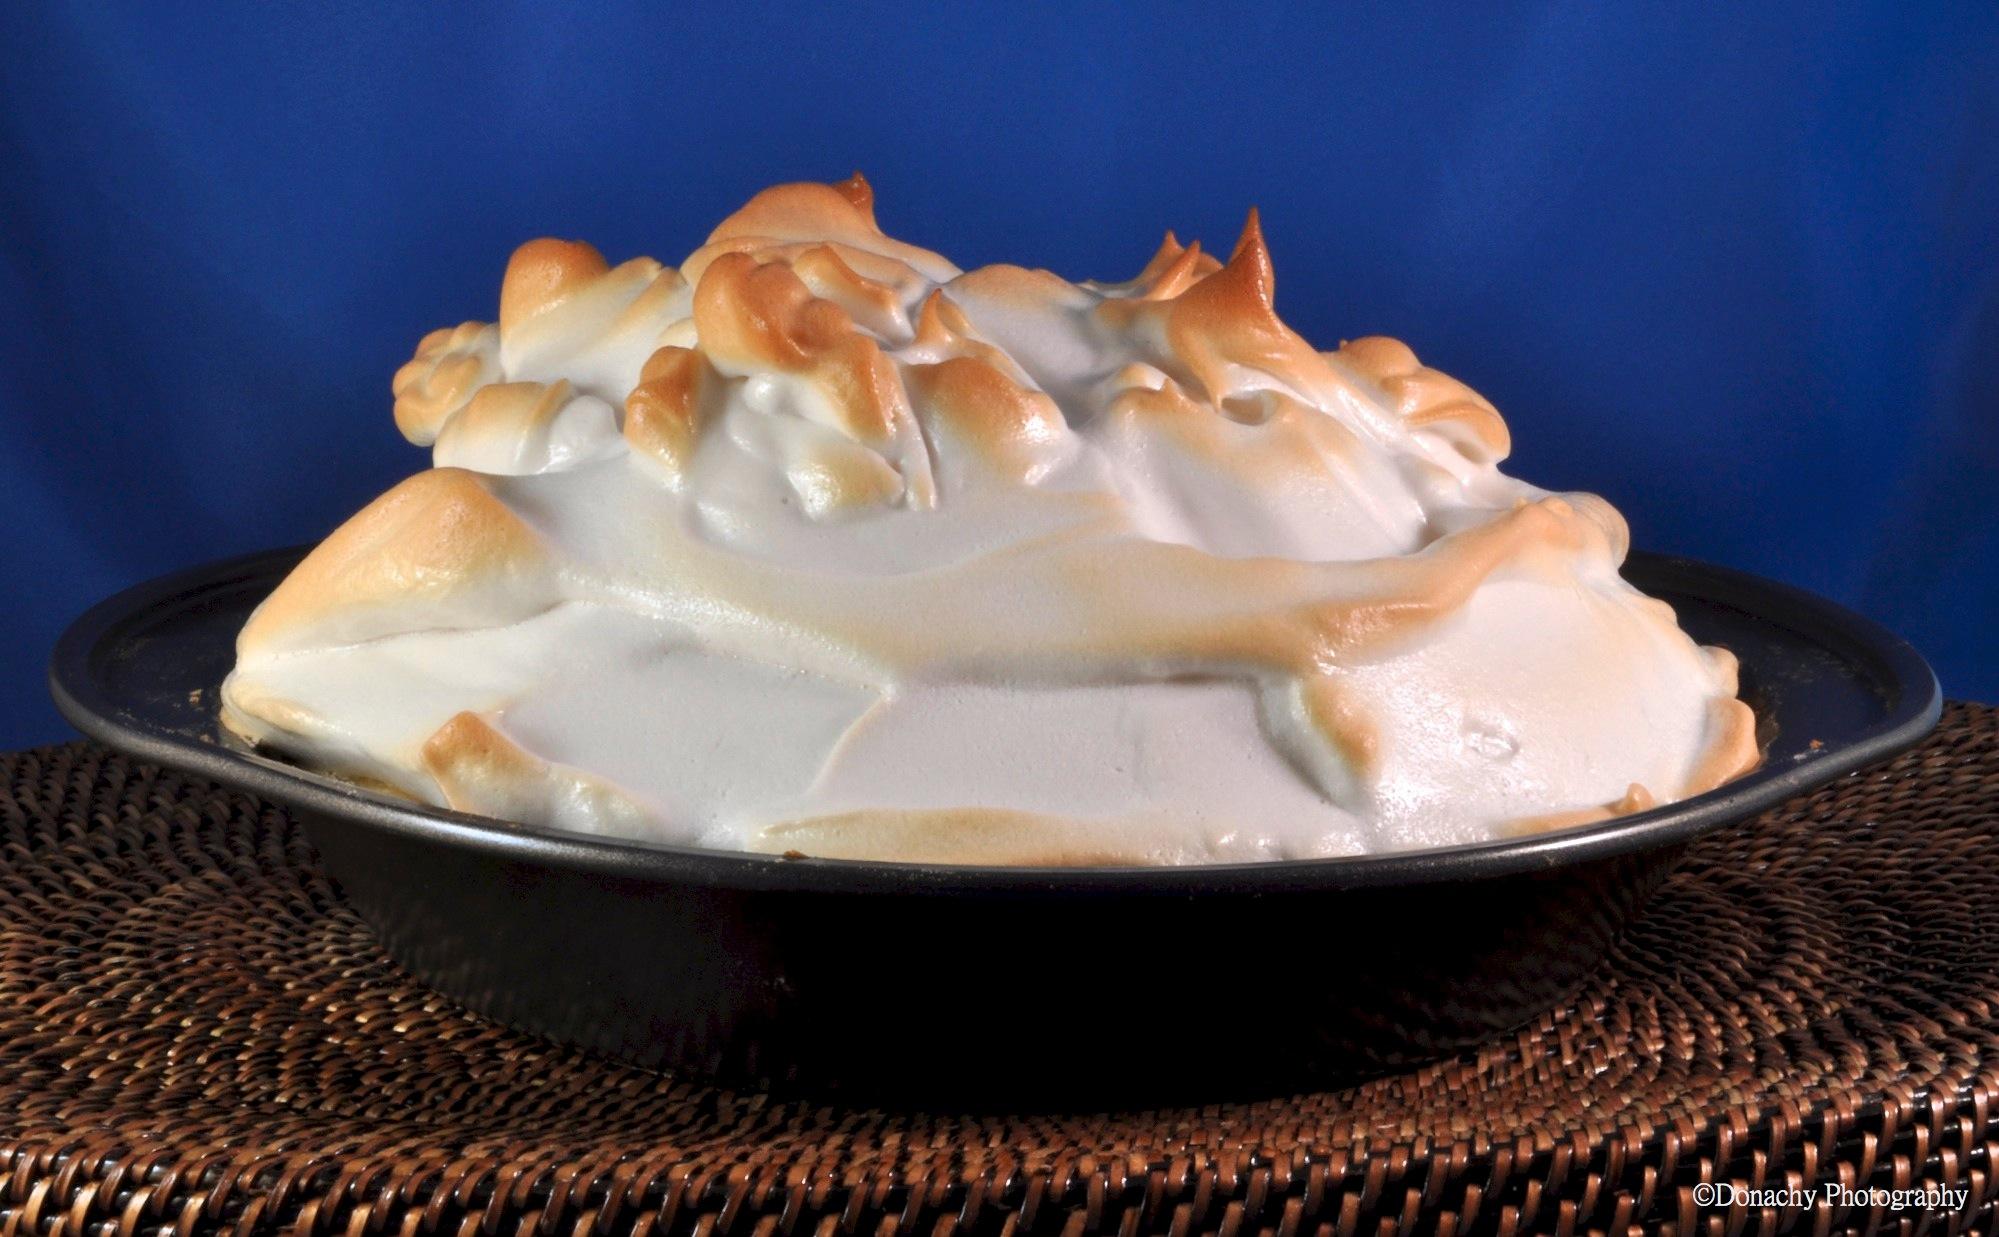 Chocolate Orange Meringue Pie | CutterLight